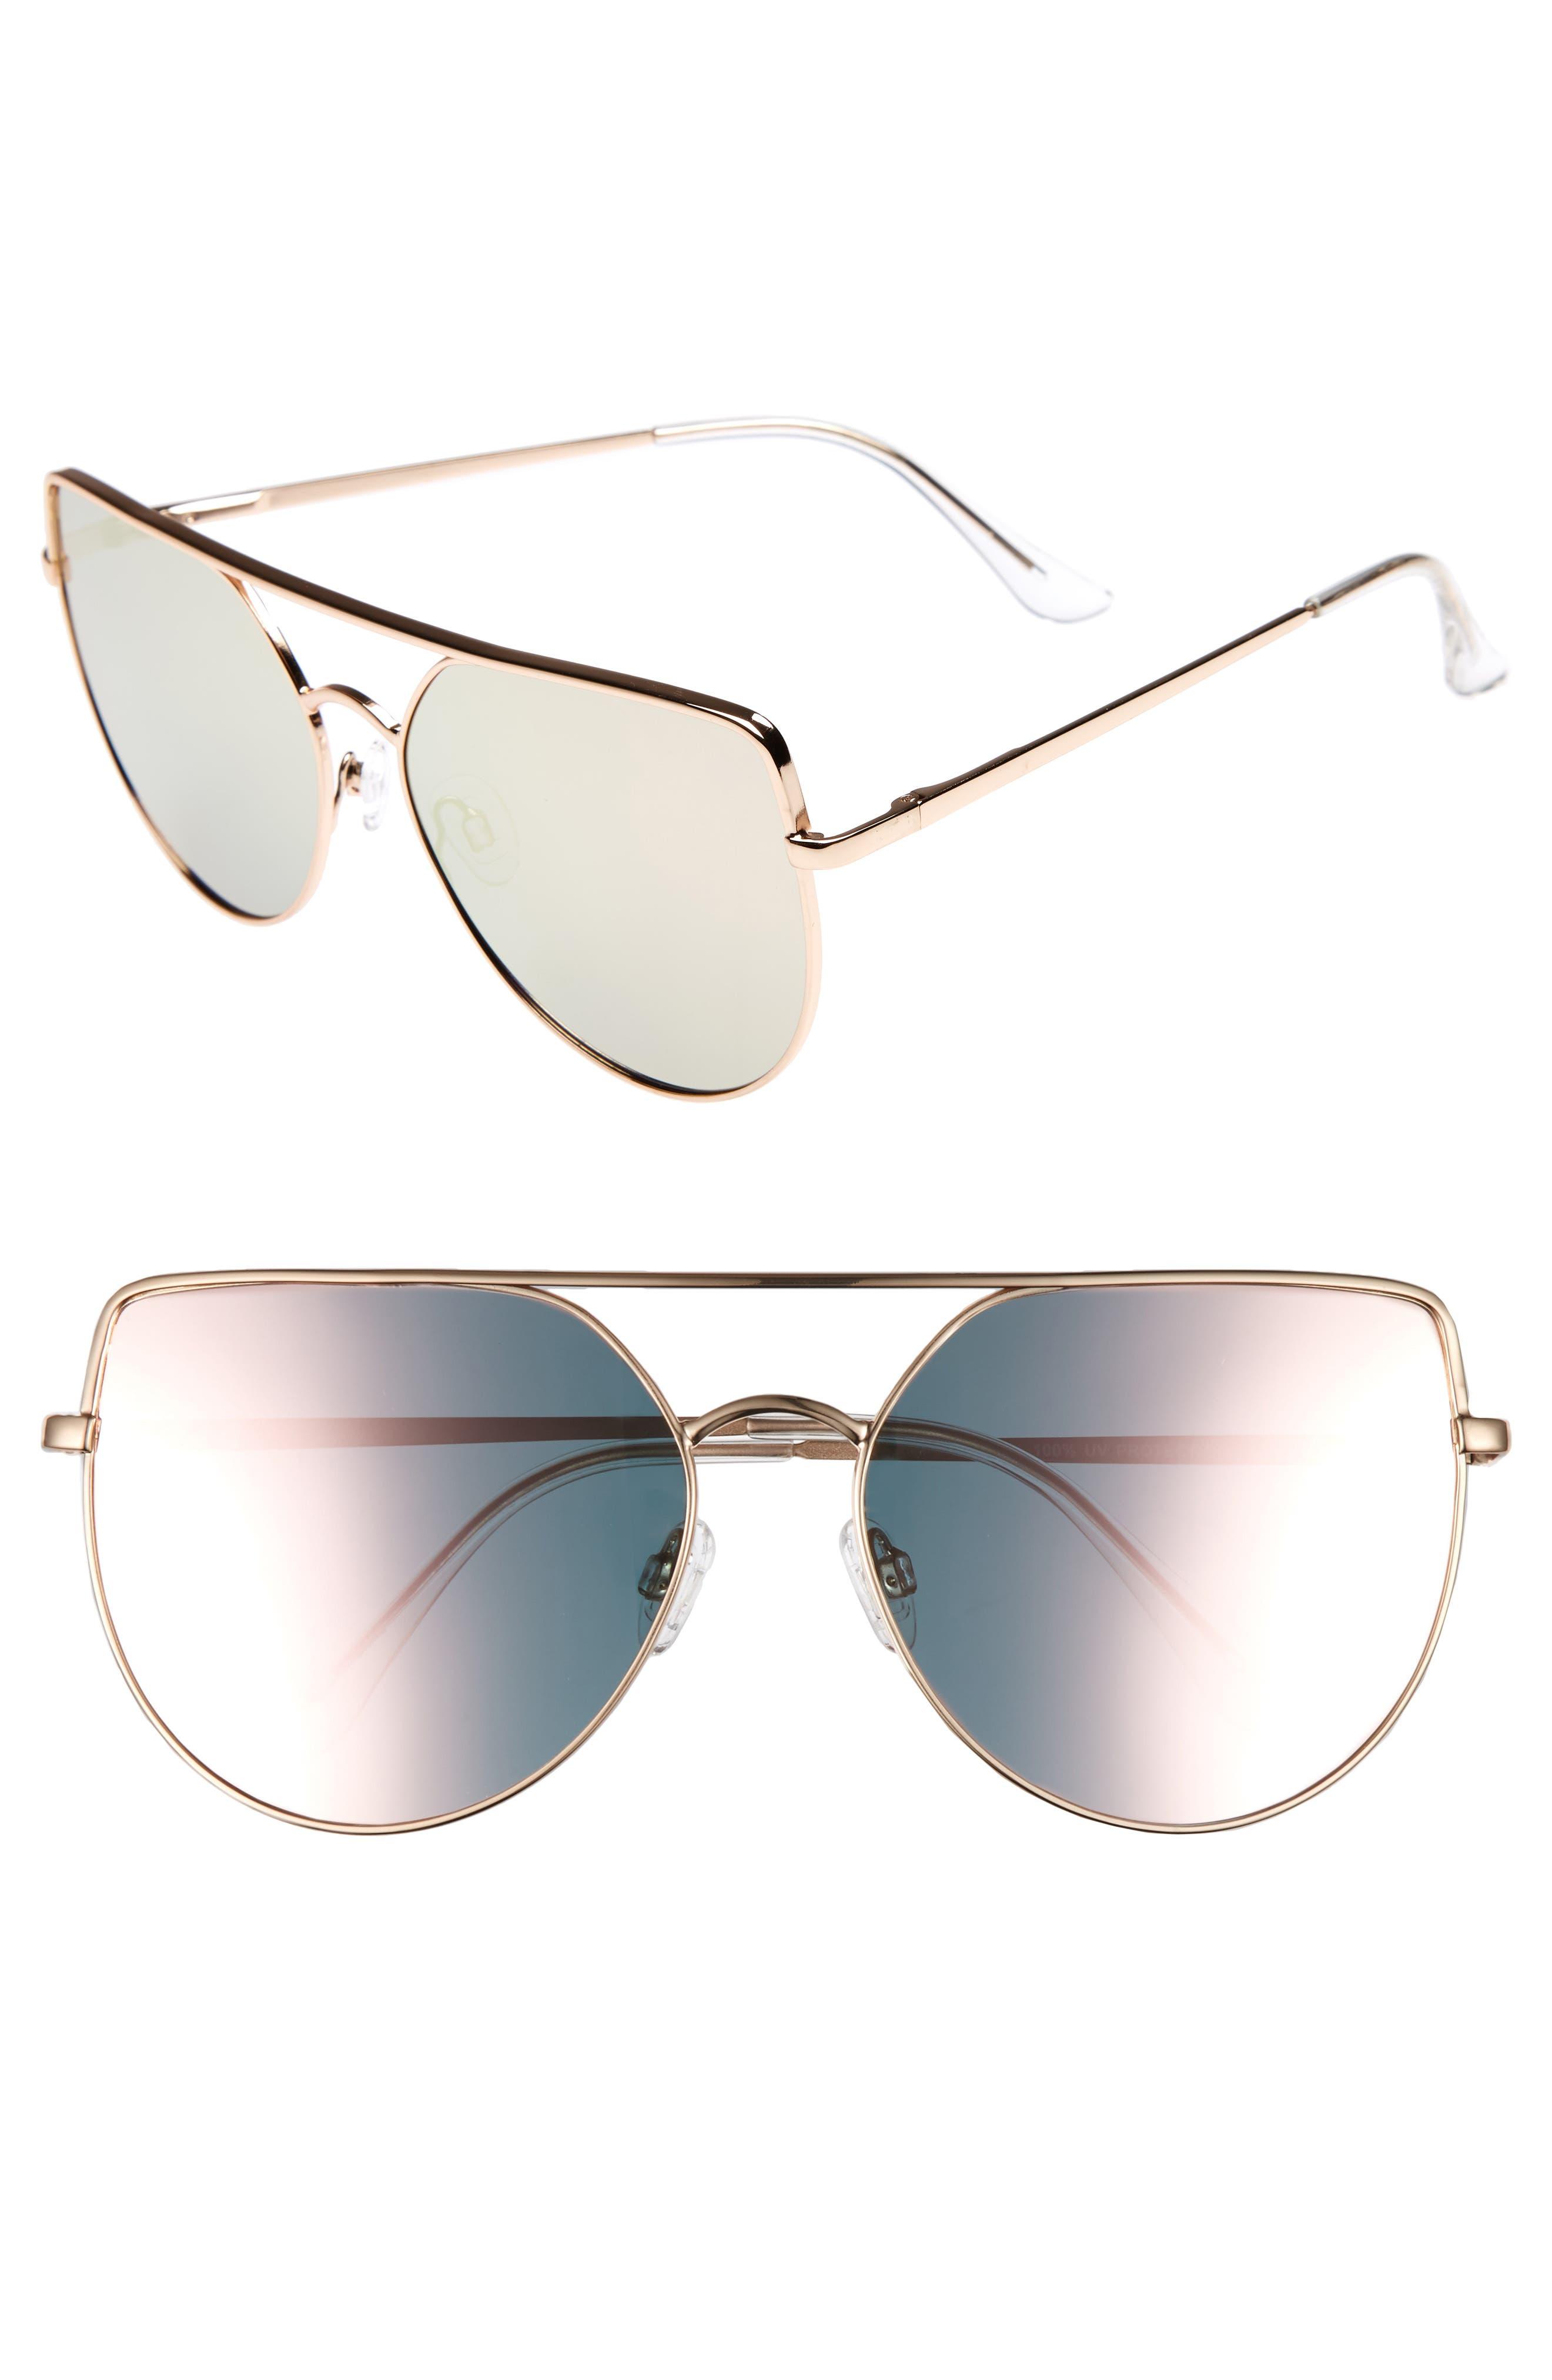 Main Image - Leith 60mm Aviator Sunglasses